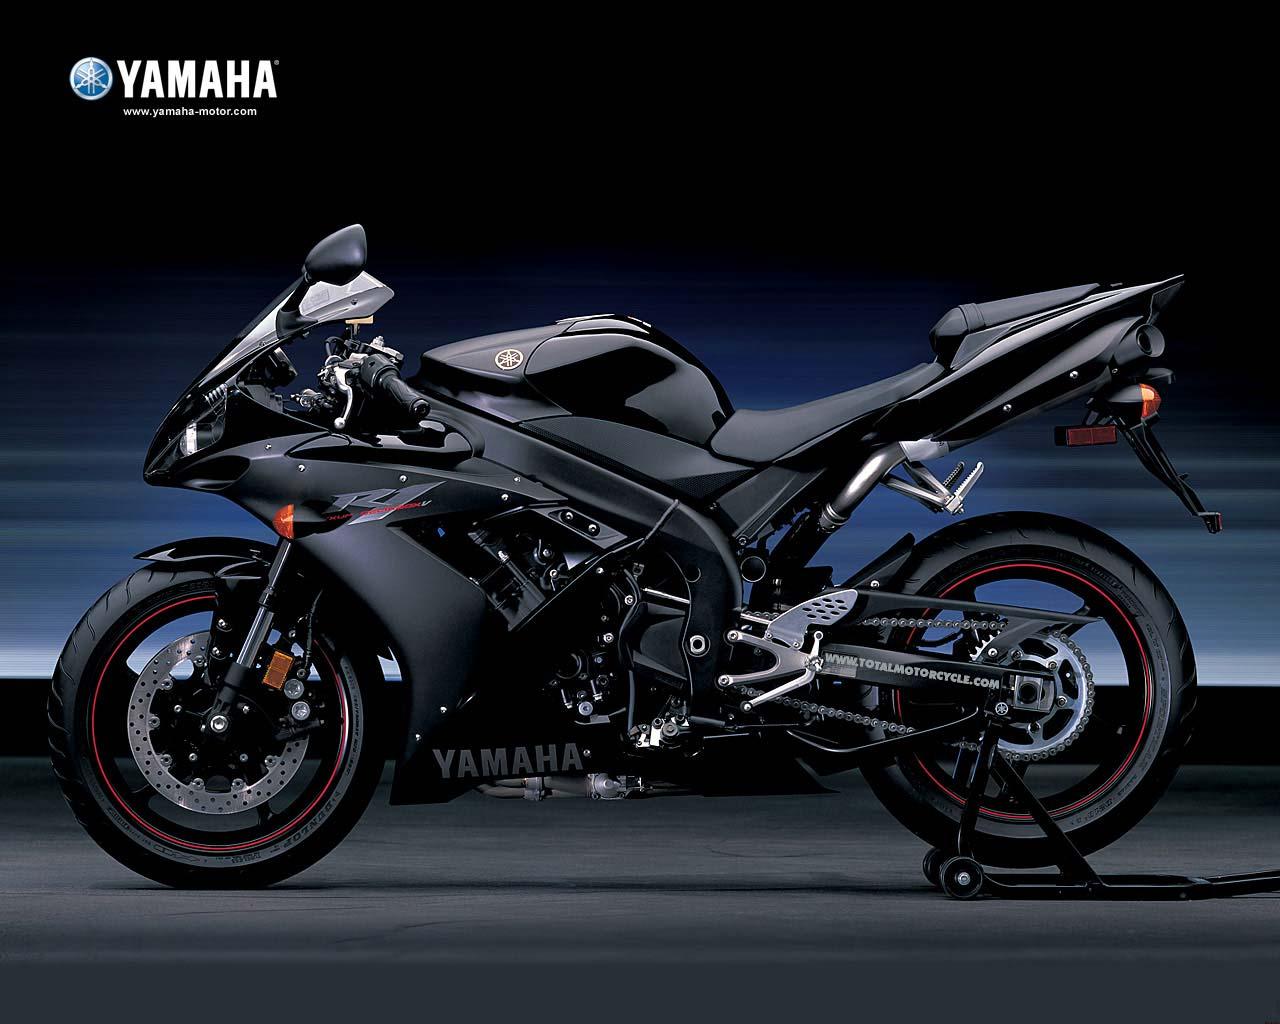 Yamaha R6 Wallpaper 7398 Hd Wallpapers in Bikes   Imagescicom 1280x1024